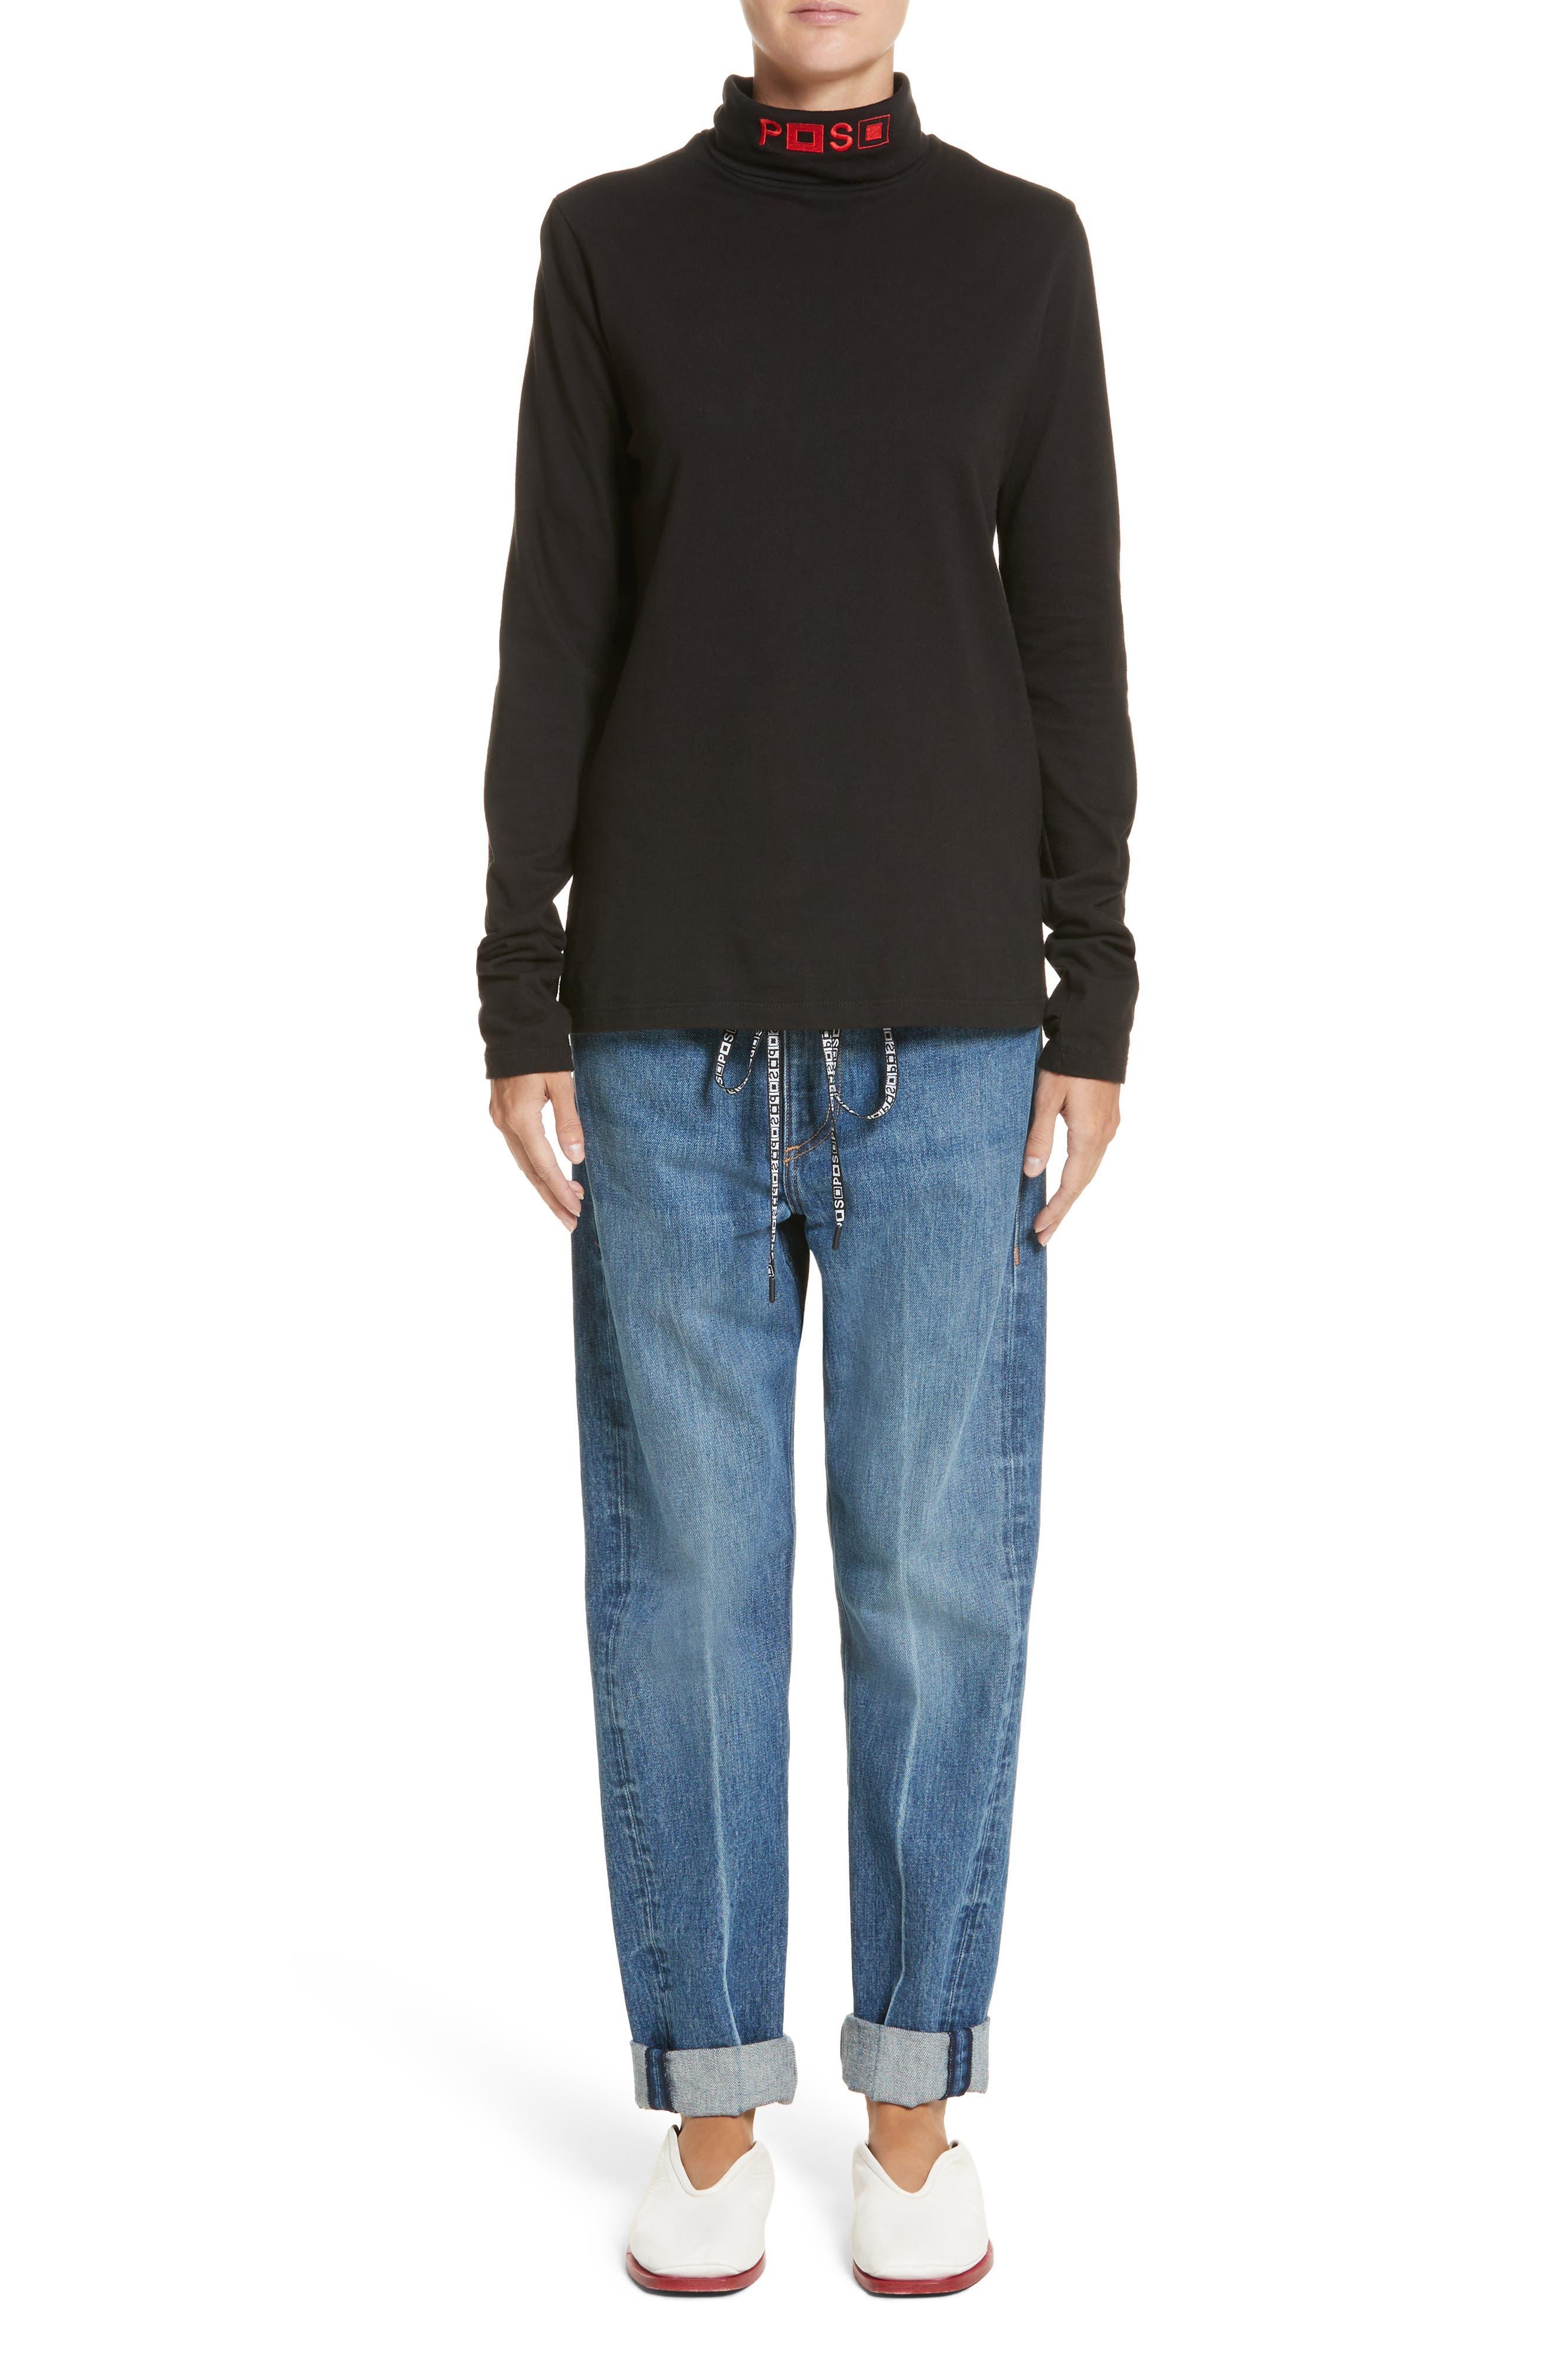 PSWL Cuffed Straight Leg Jeans,                             Alternate thumbnail 9, color,                             Medium Blue